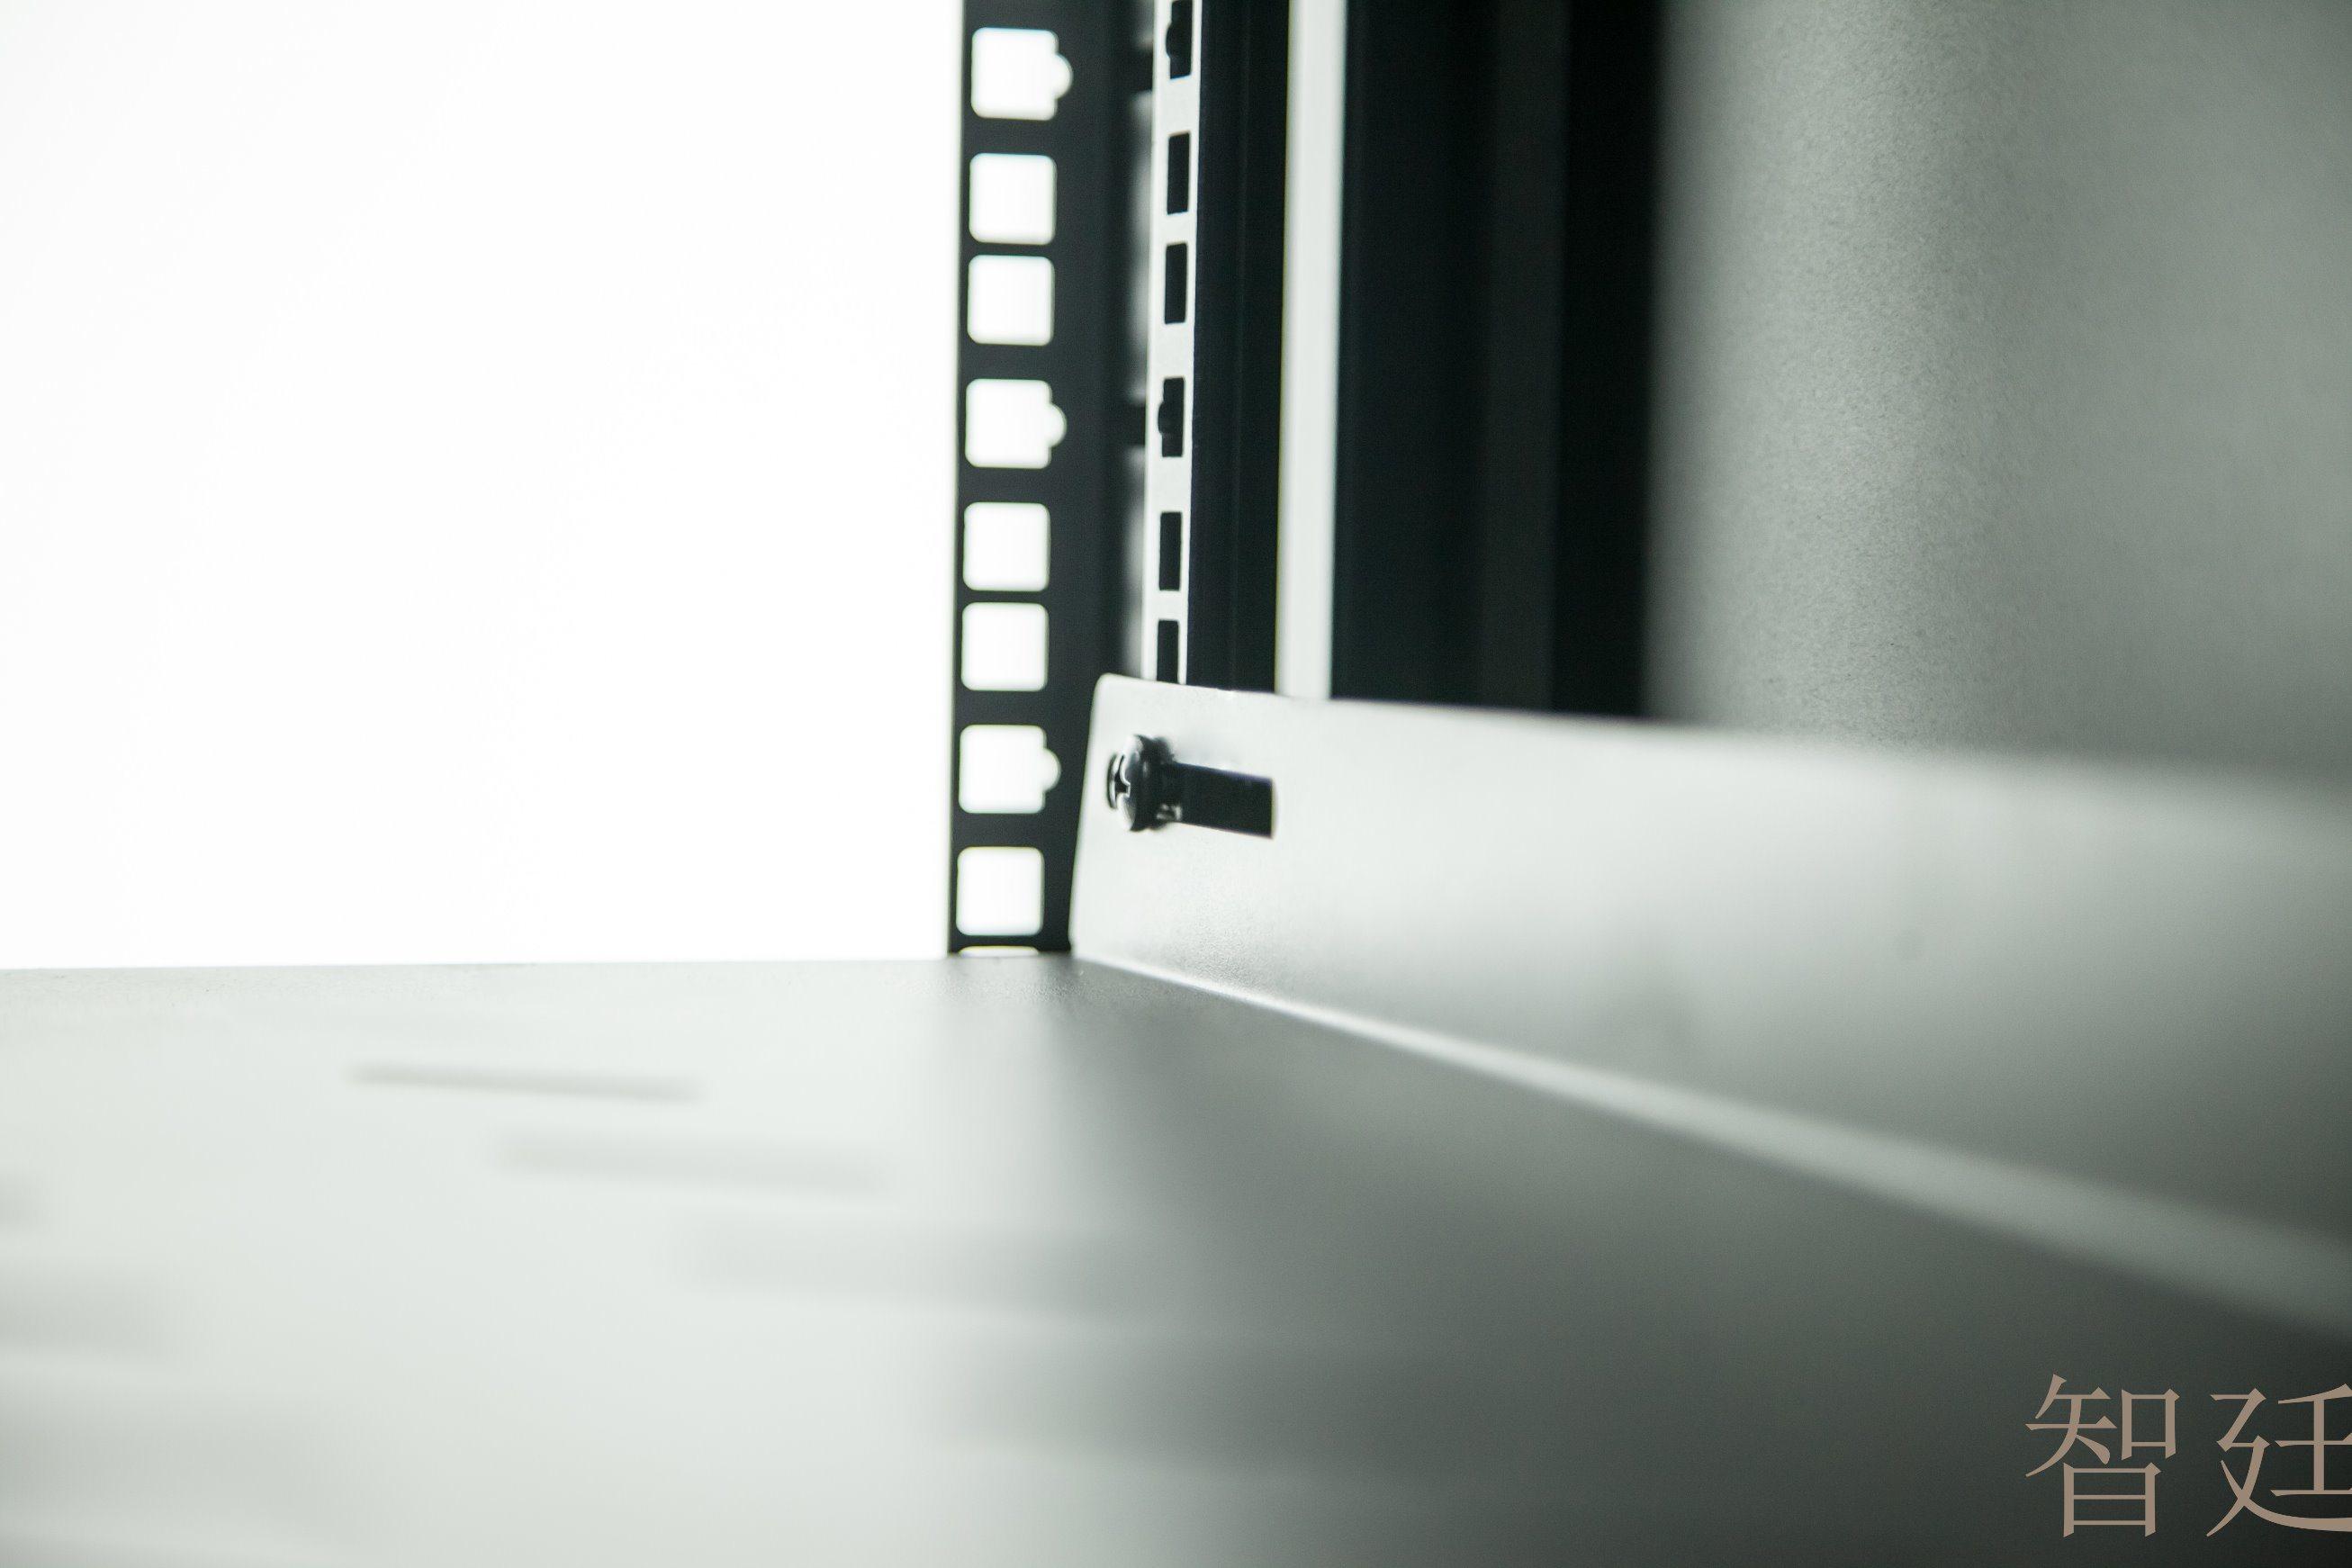 Cabinet Airflow Blocking Free-Installation Blind Plate